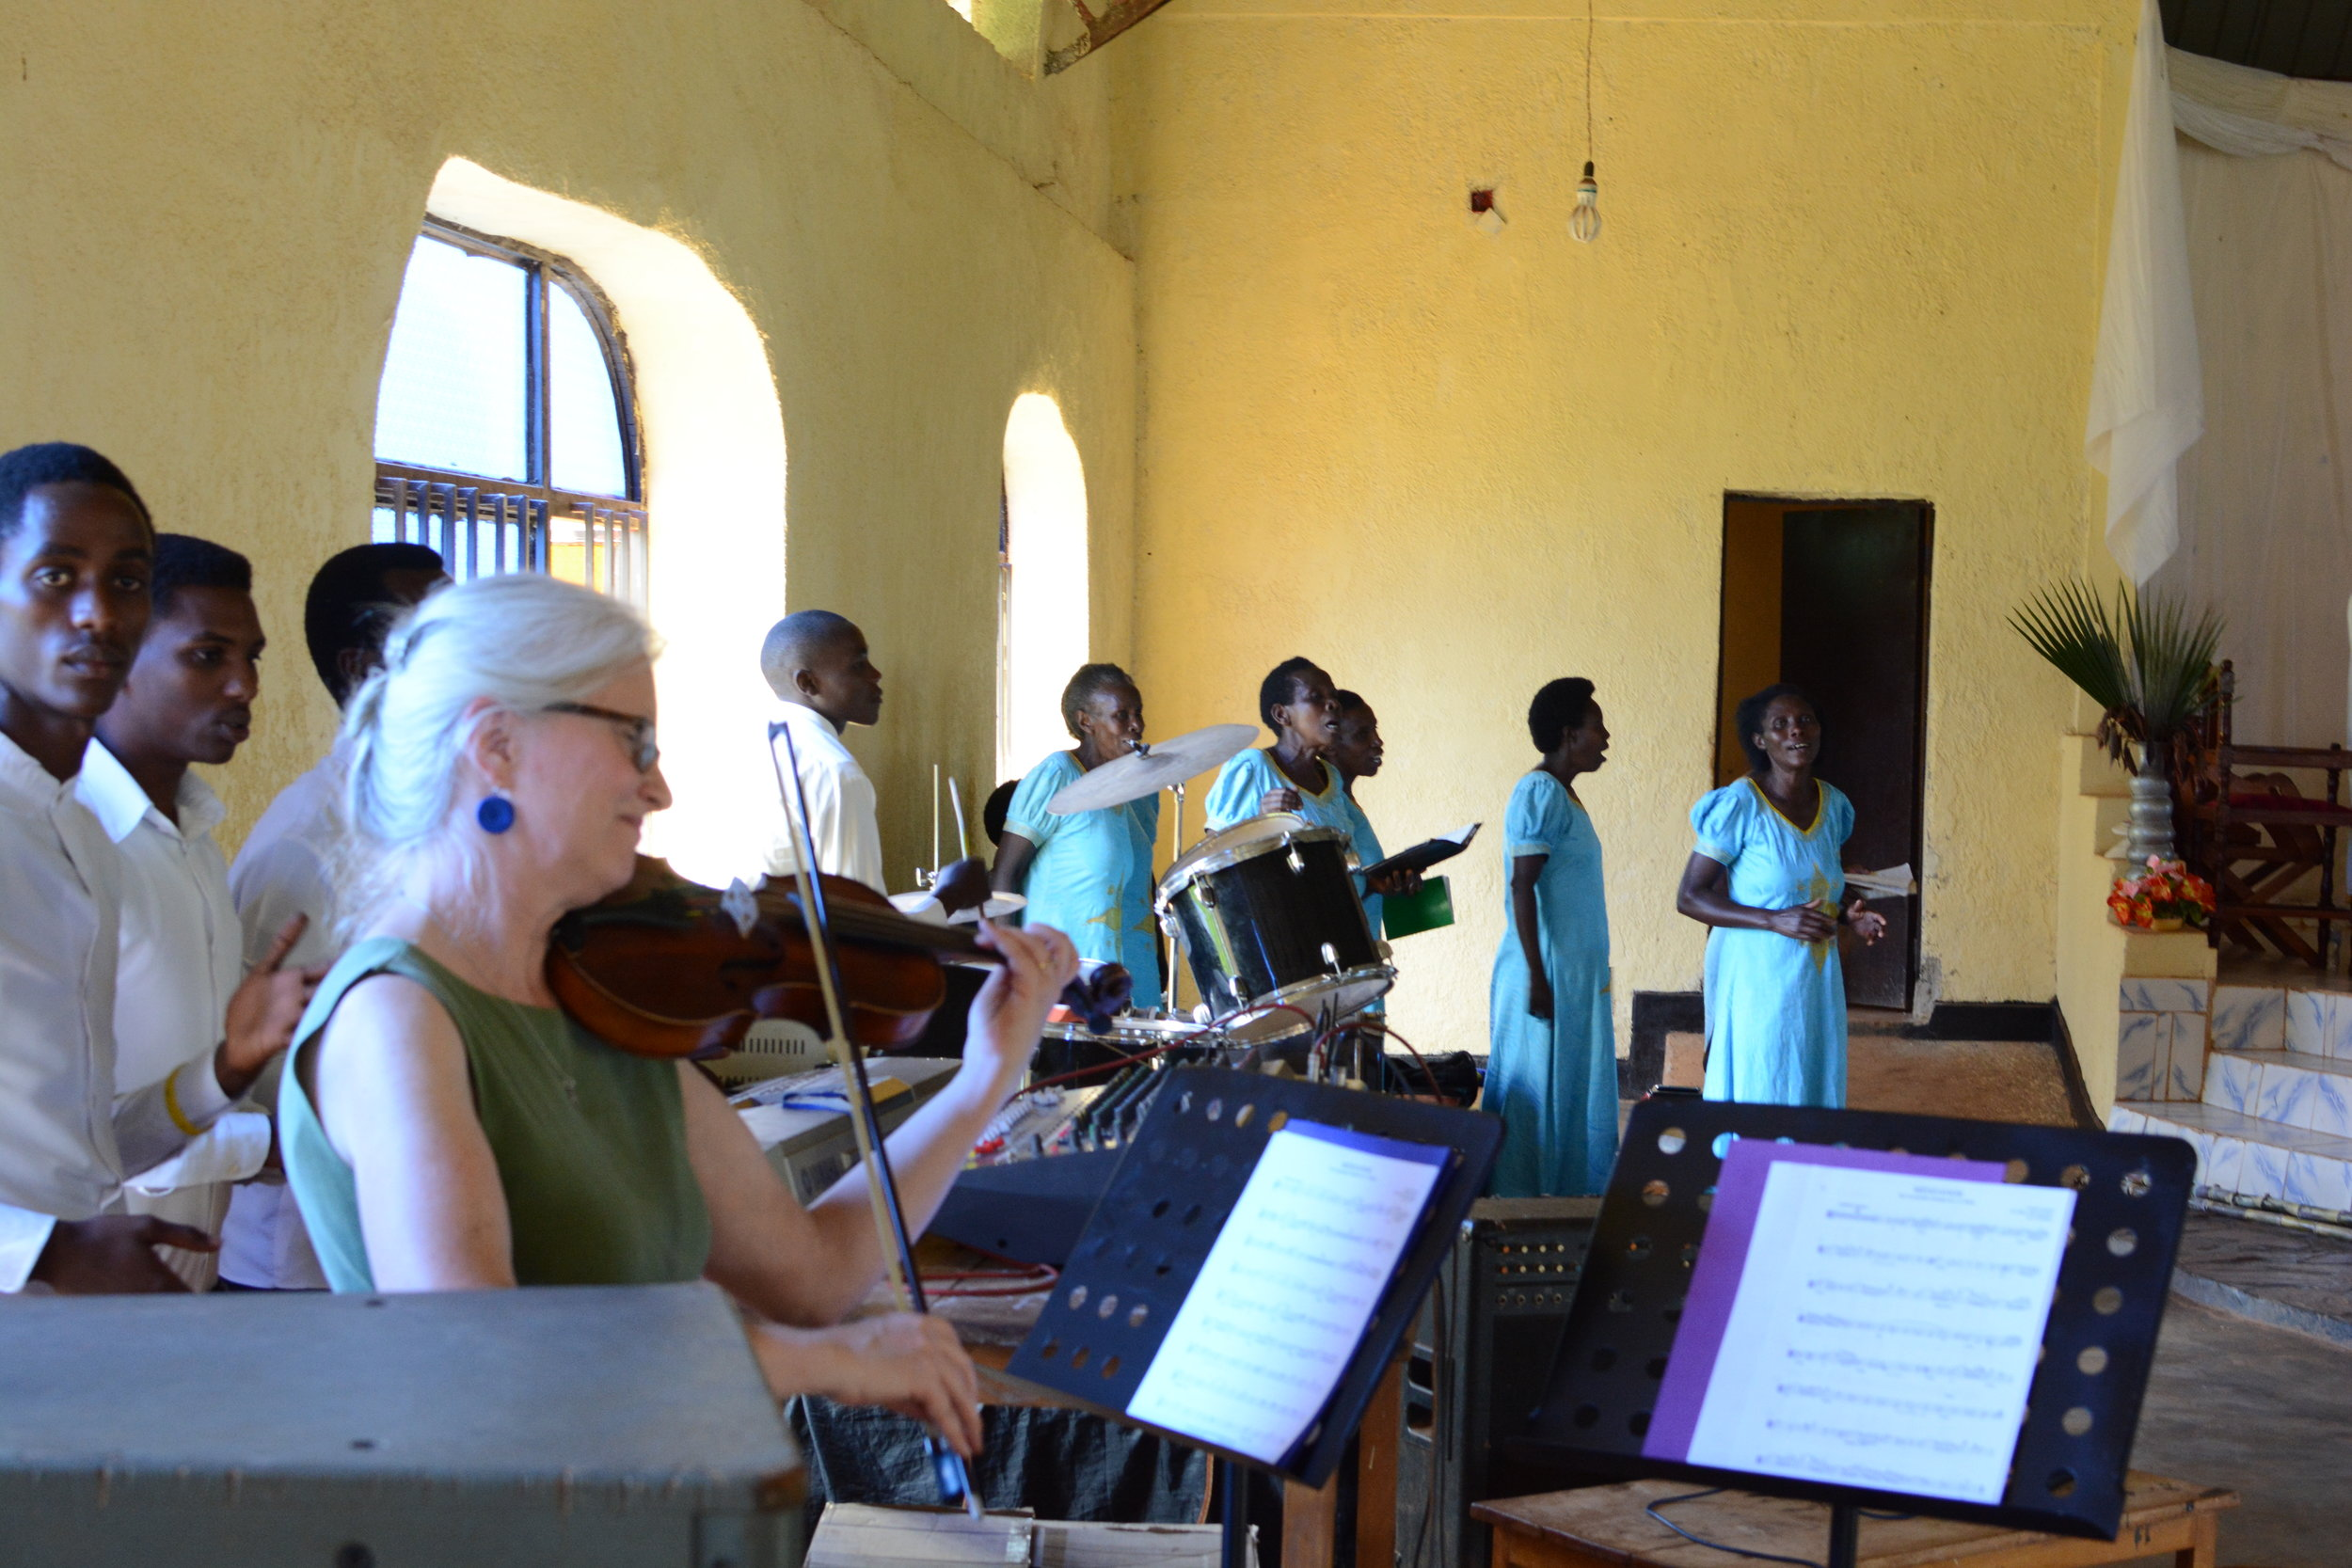 Terri Moon accompanying the singing on violin